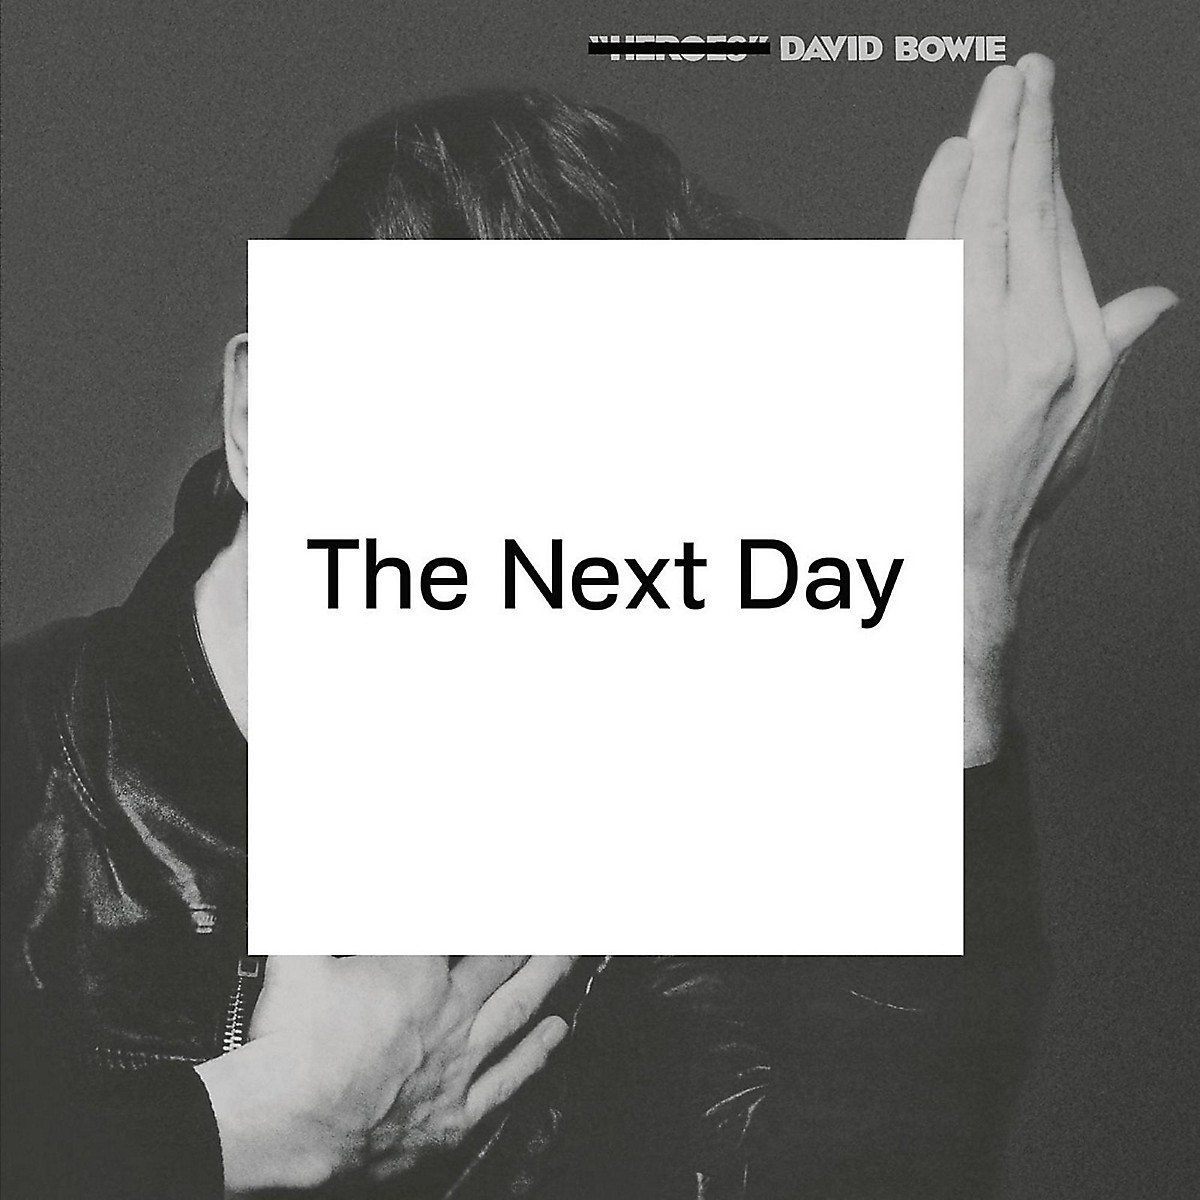 Sony David Bowie The Next Day 3 LP